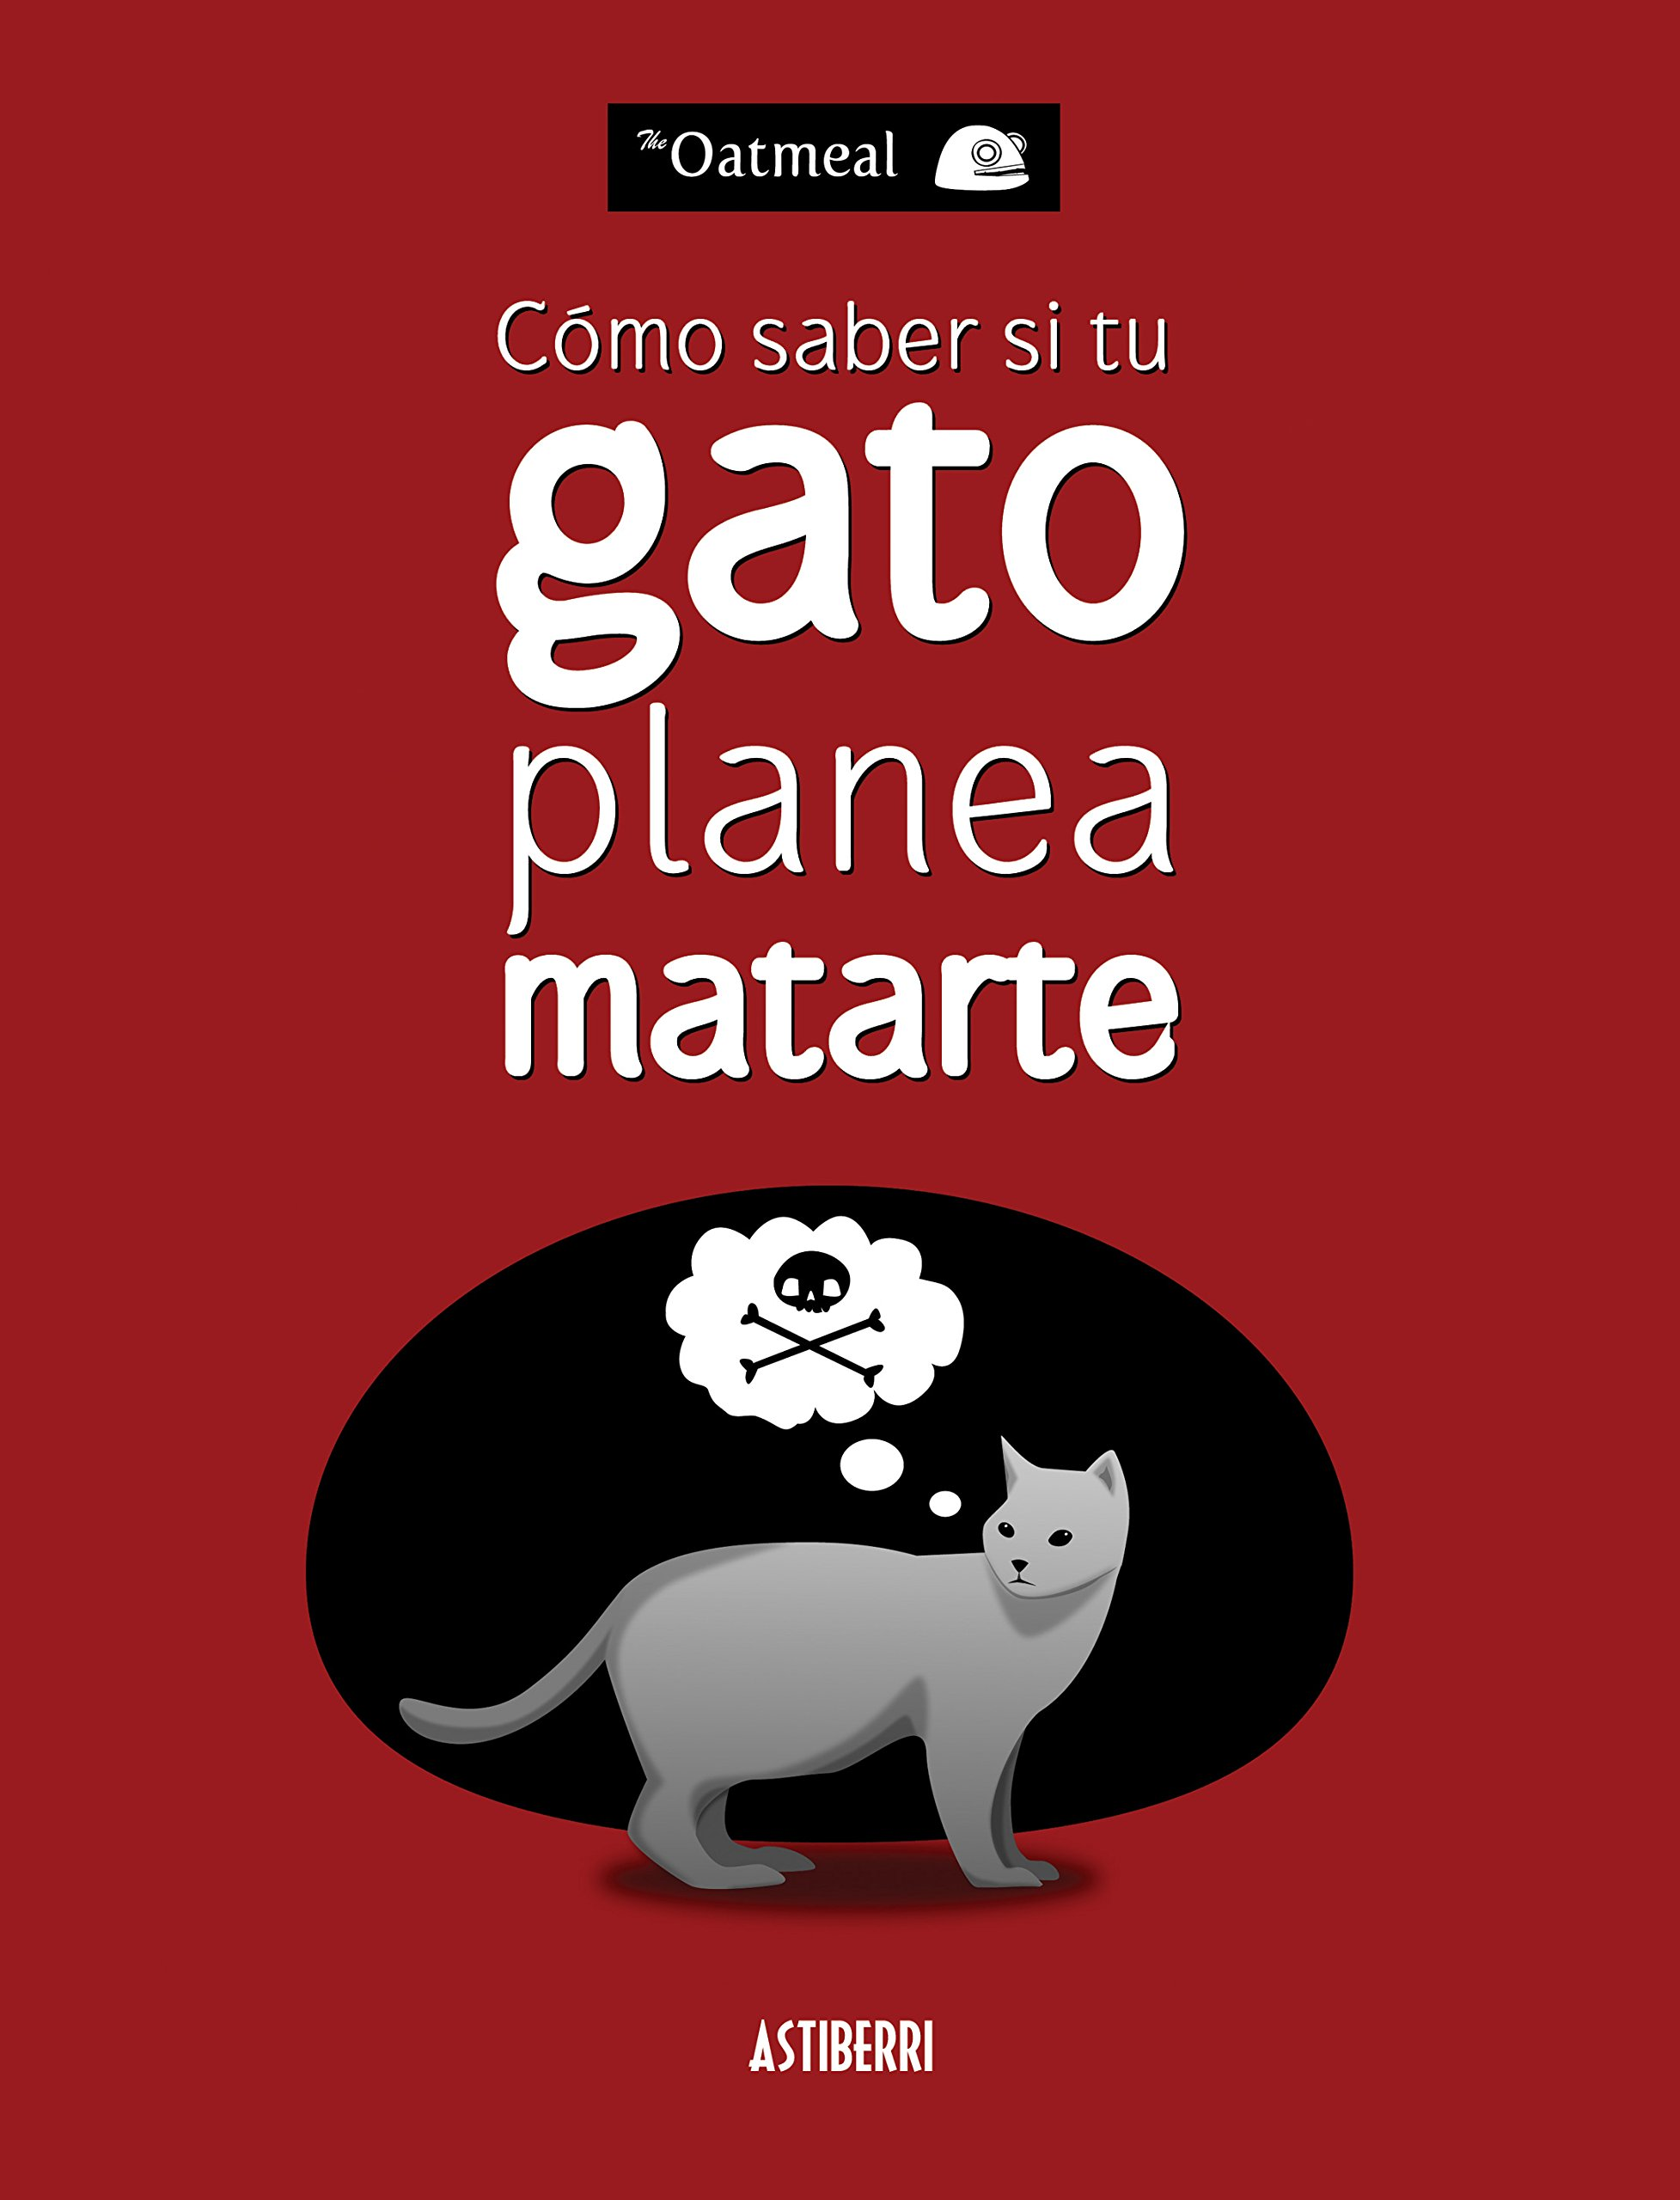 Cómo saber si tu gato planea matarte (Kili Kili) Tapa blanda – 27 jun 2013 The Oatmeal Óscar Palmer Astiberri 841568522X